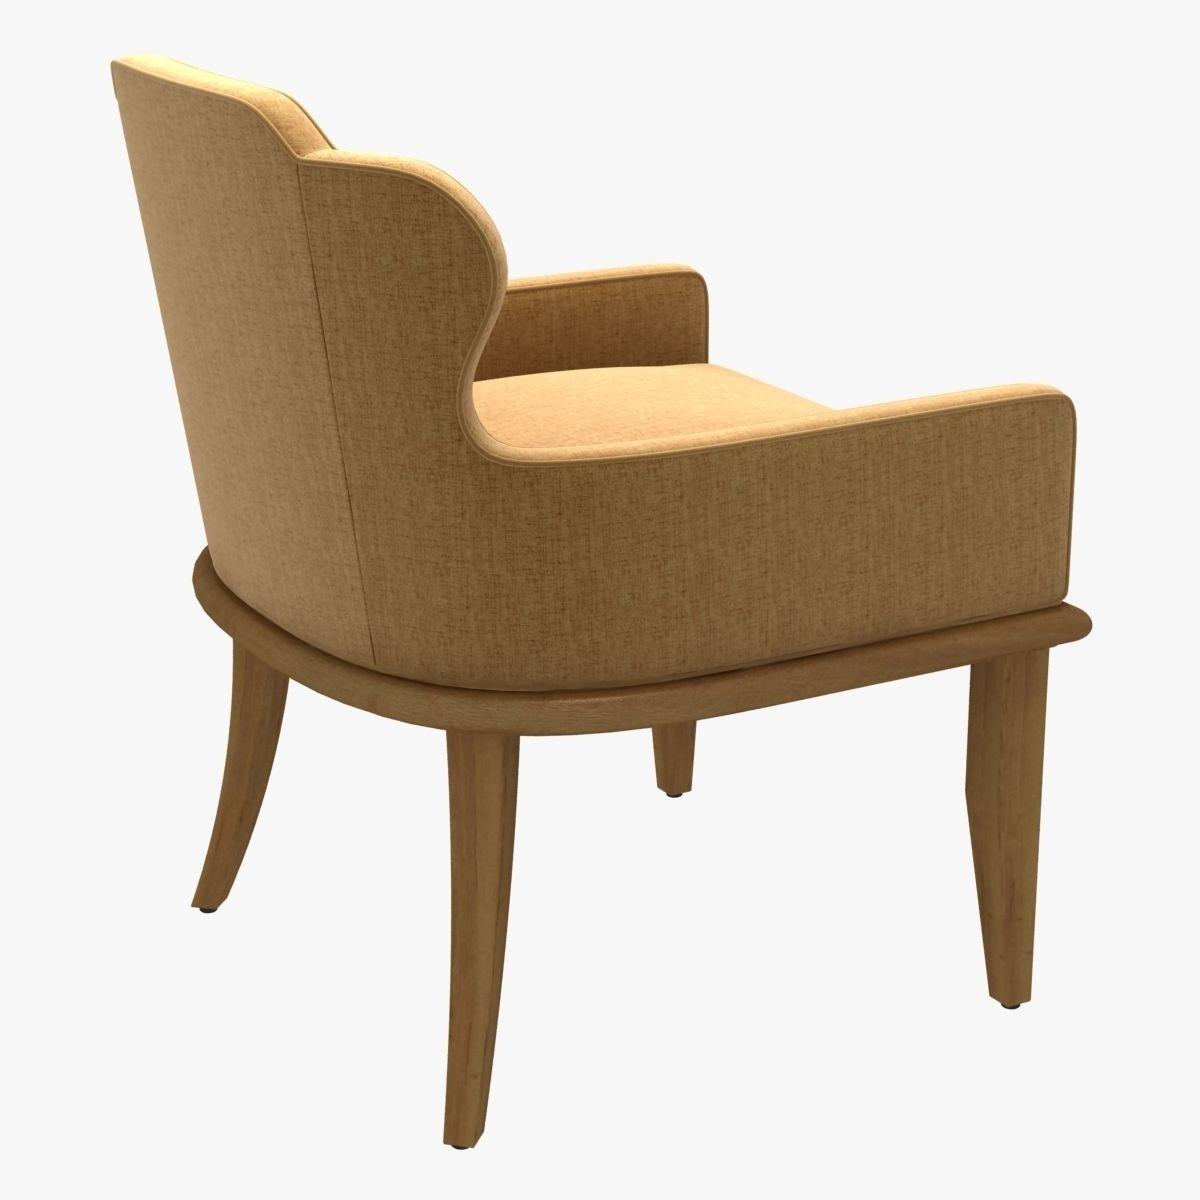 Merveilleux ... Charter Furniture Halsey Occasional Lounge Chair 3d Model Max Obj 3ds  Fbx Stl Mtl 2 ...